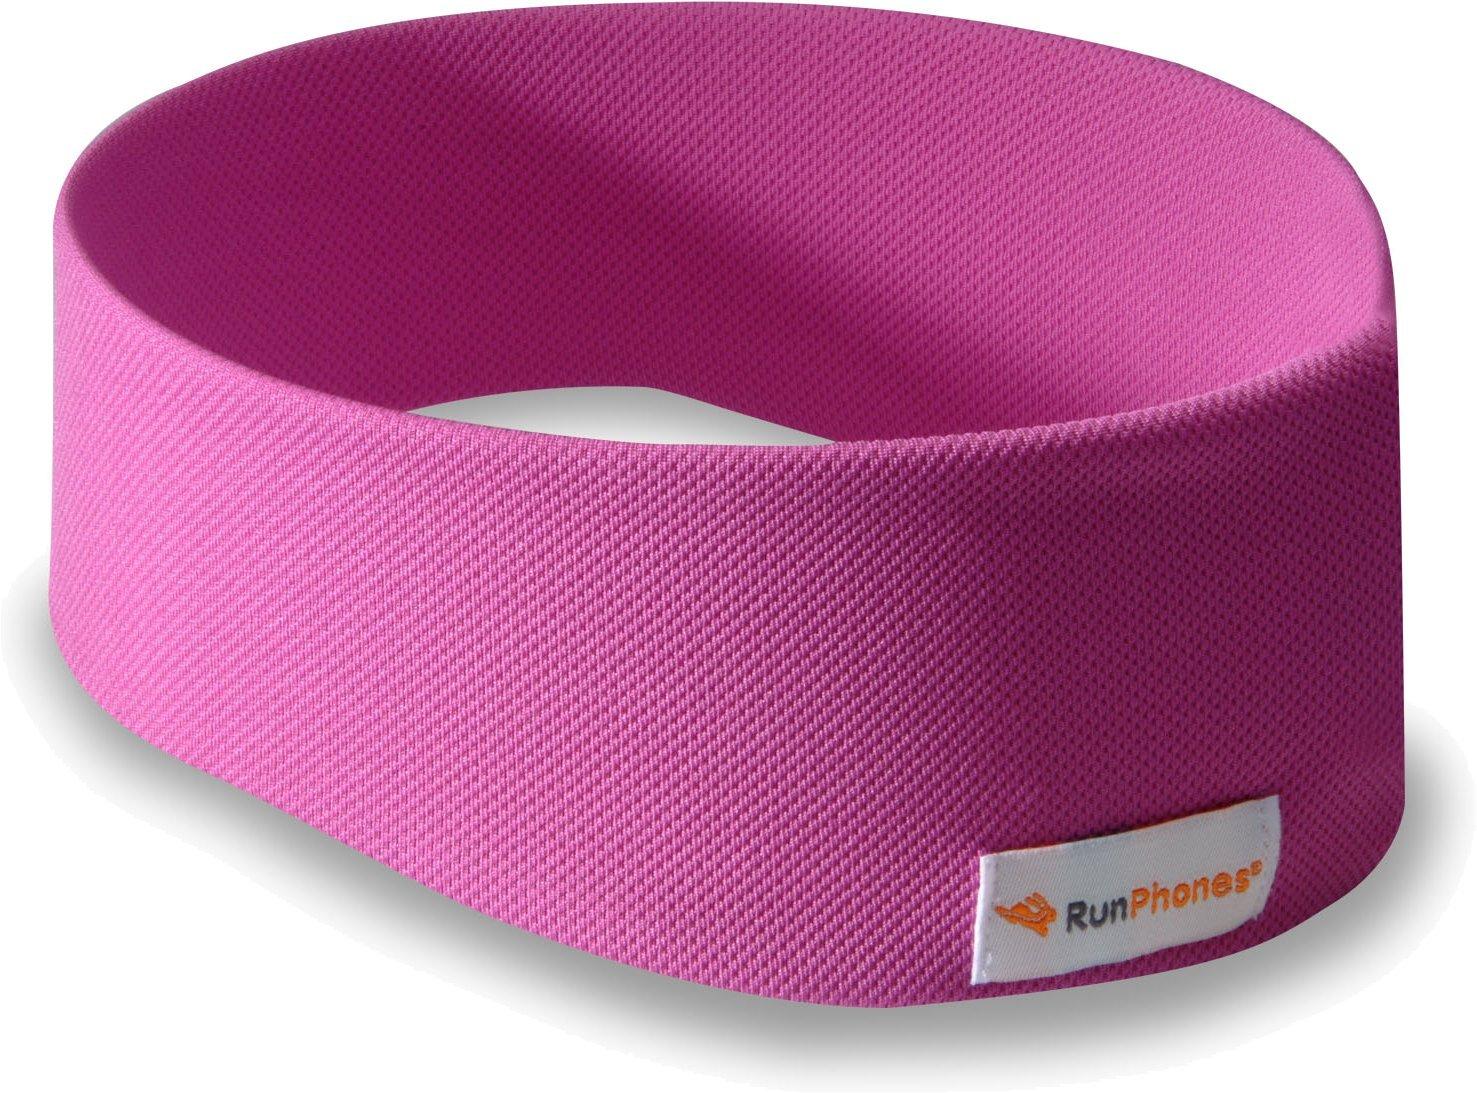 AcousticSheep RunPhones Wireless Bluetooth Headphone Headband (Wild Orchid, Medium)